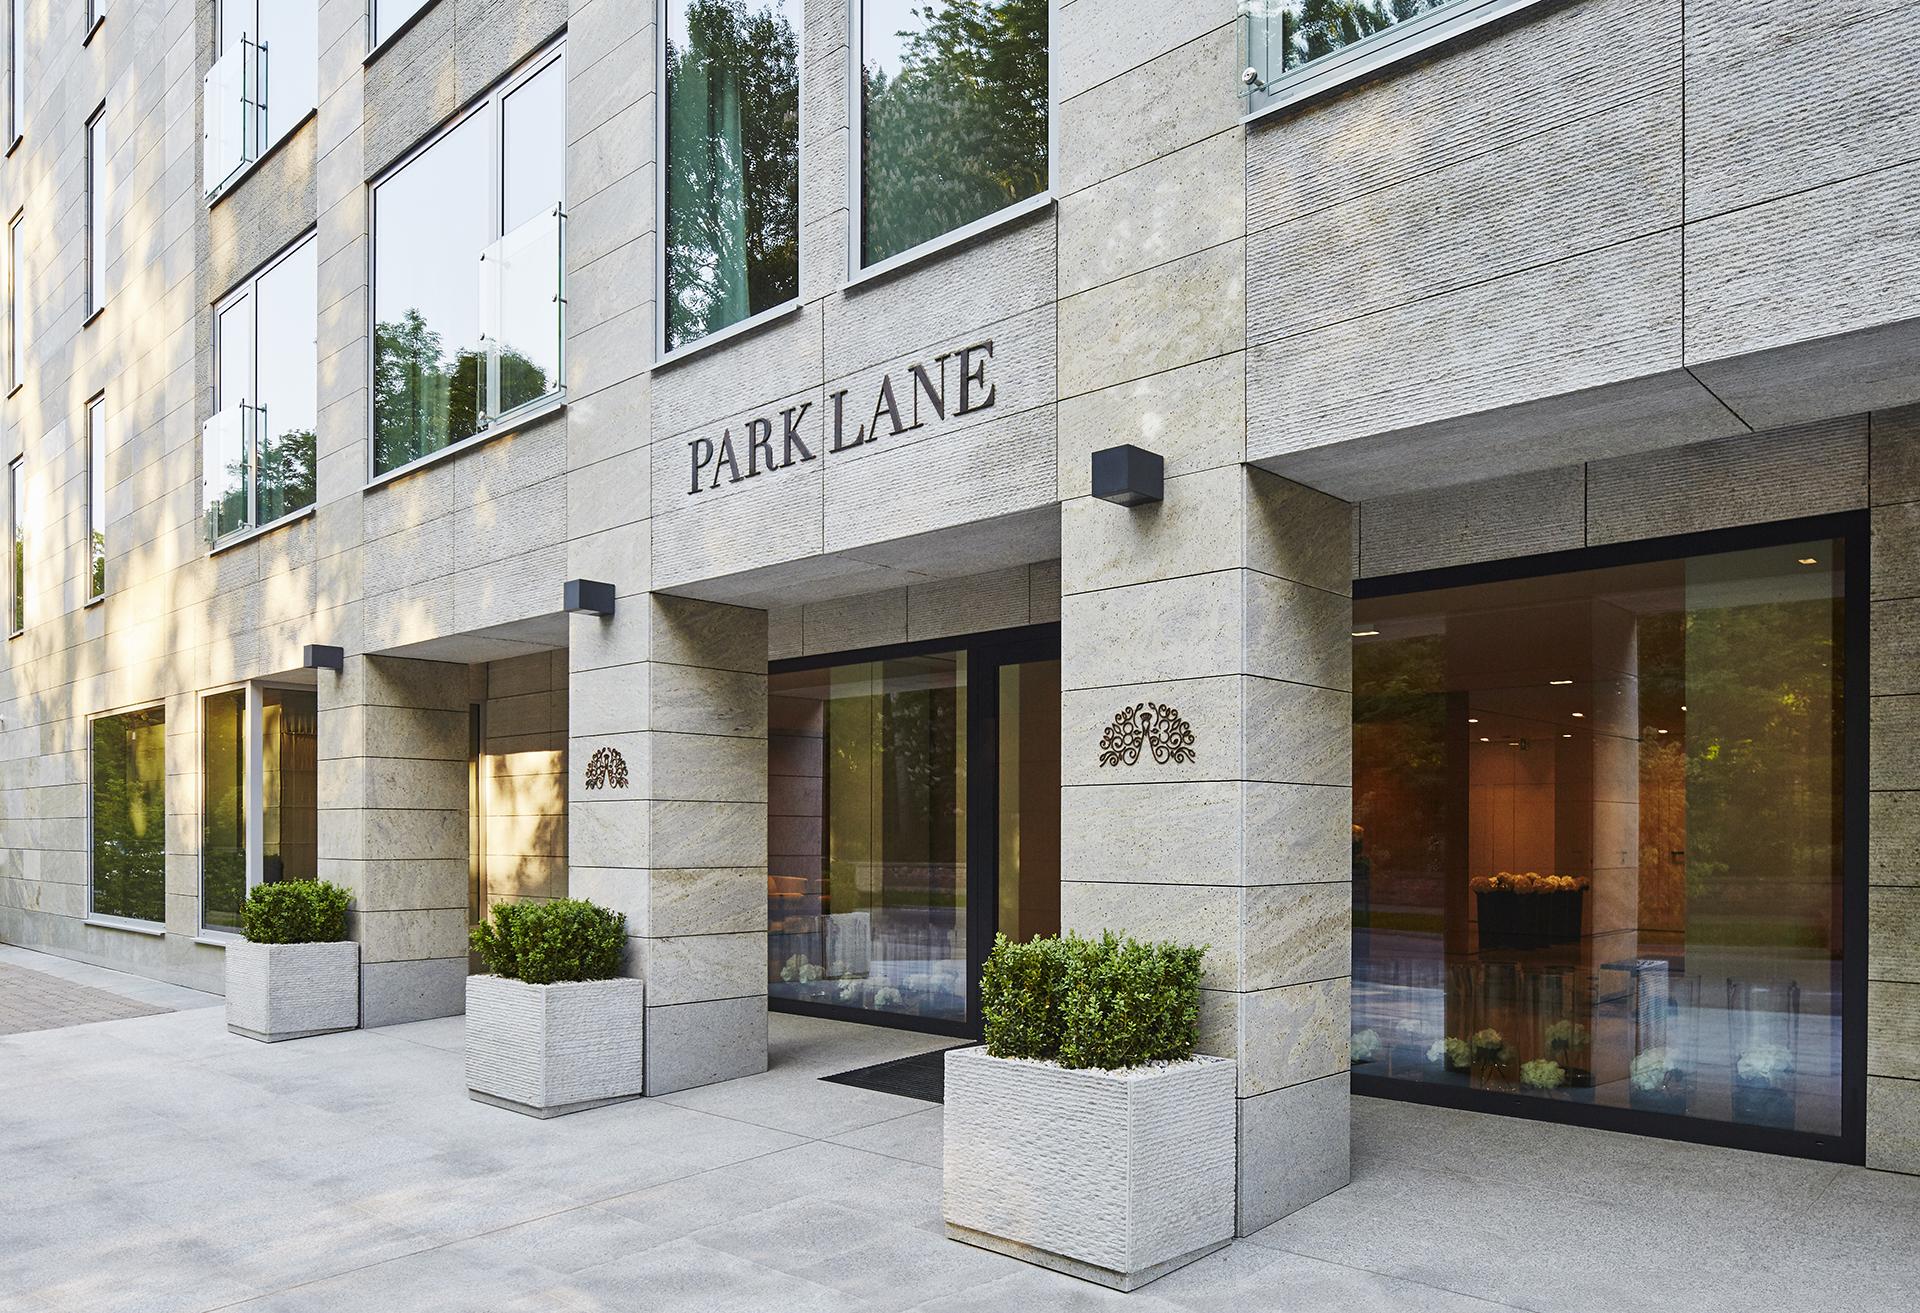 Rezydencja Park Lane - De Novo